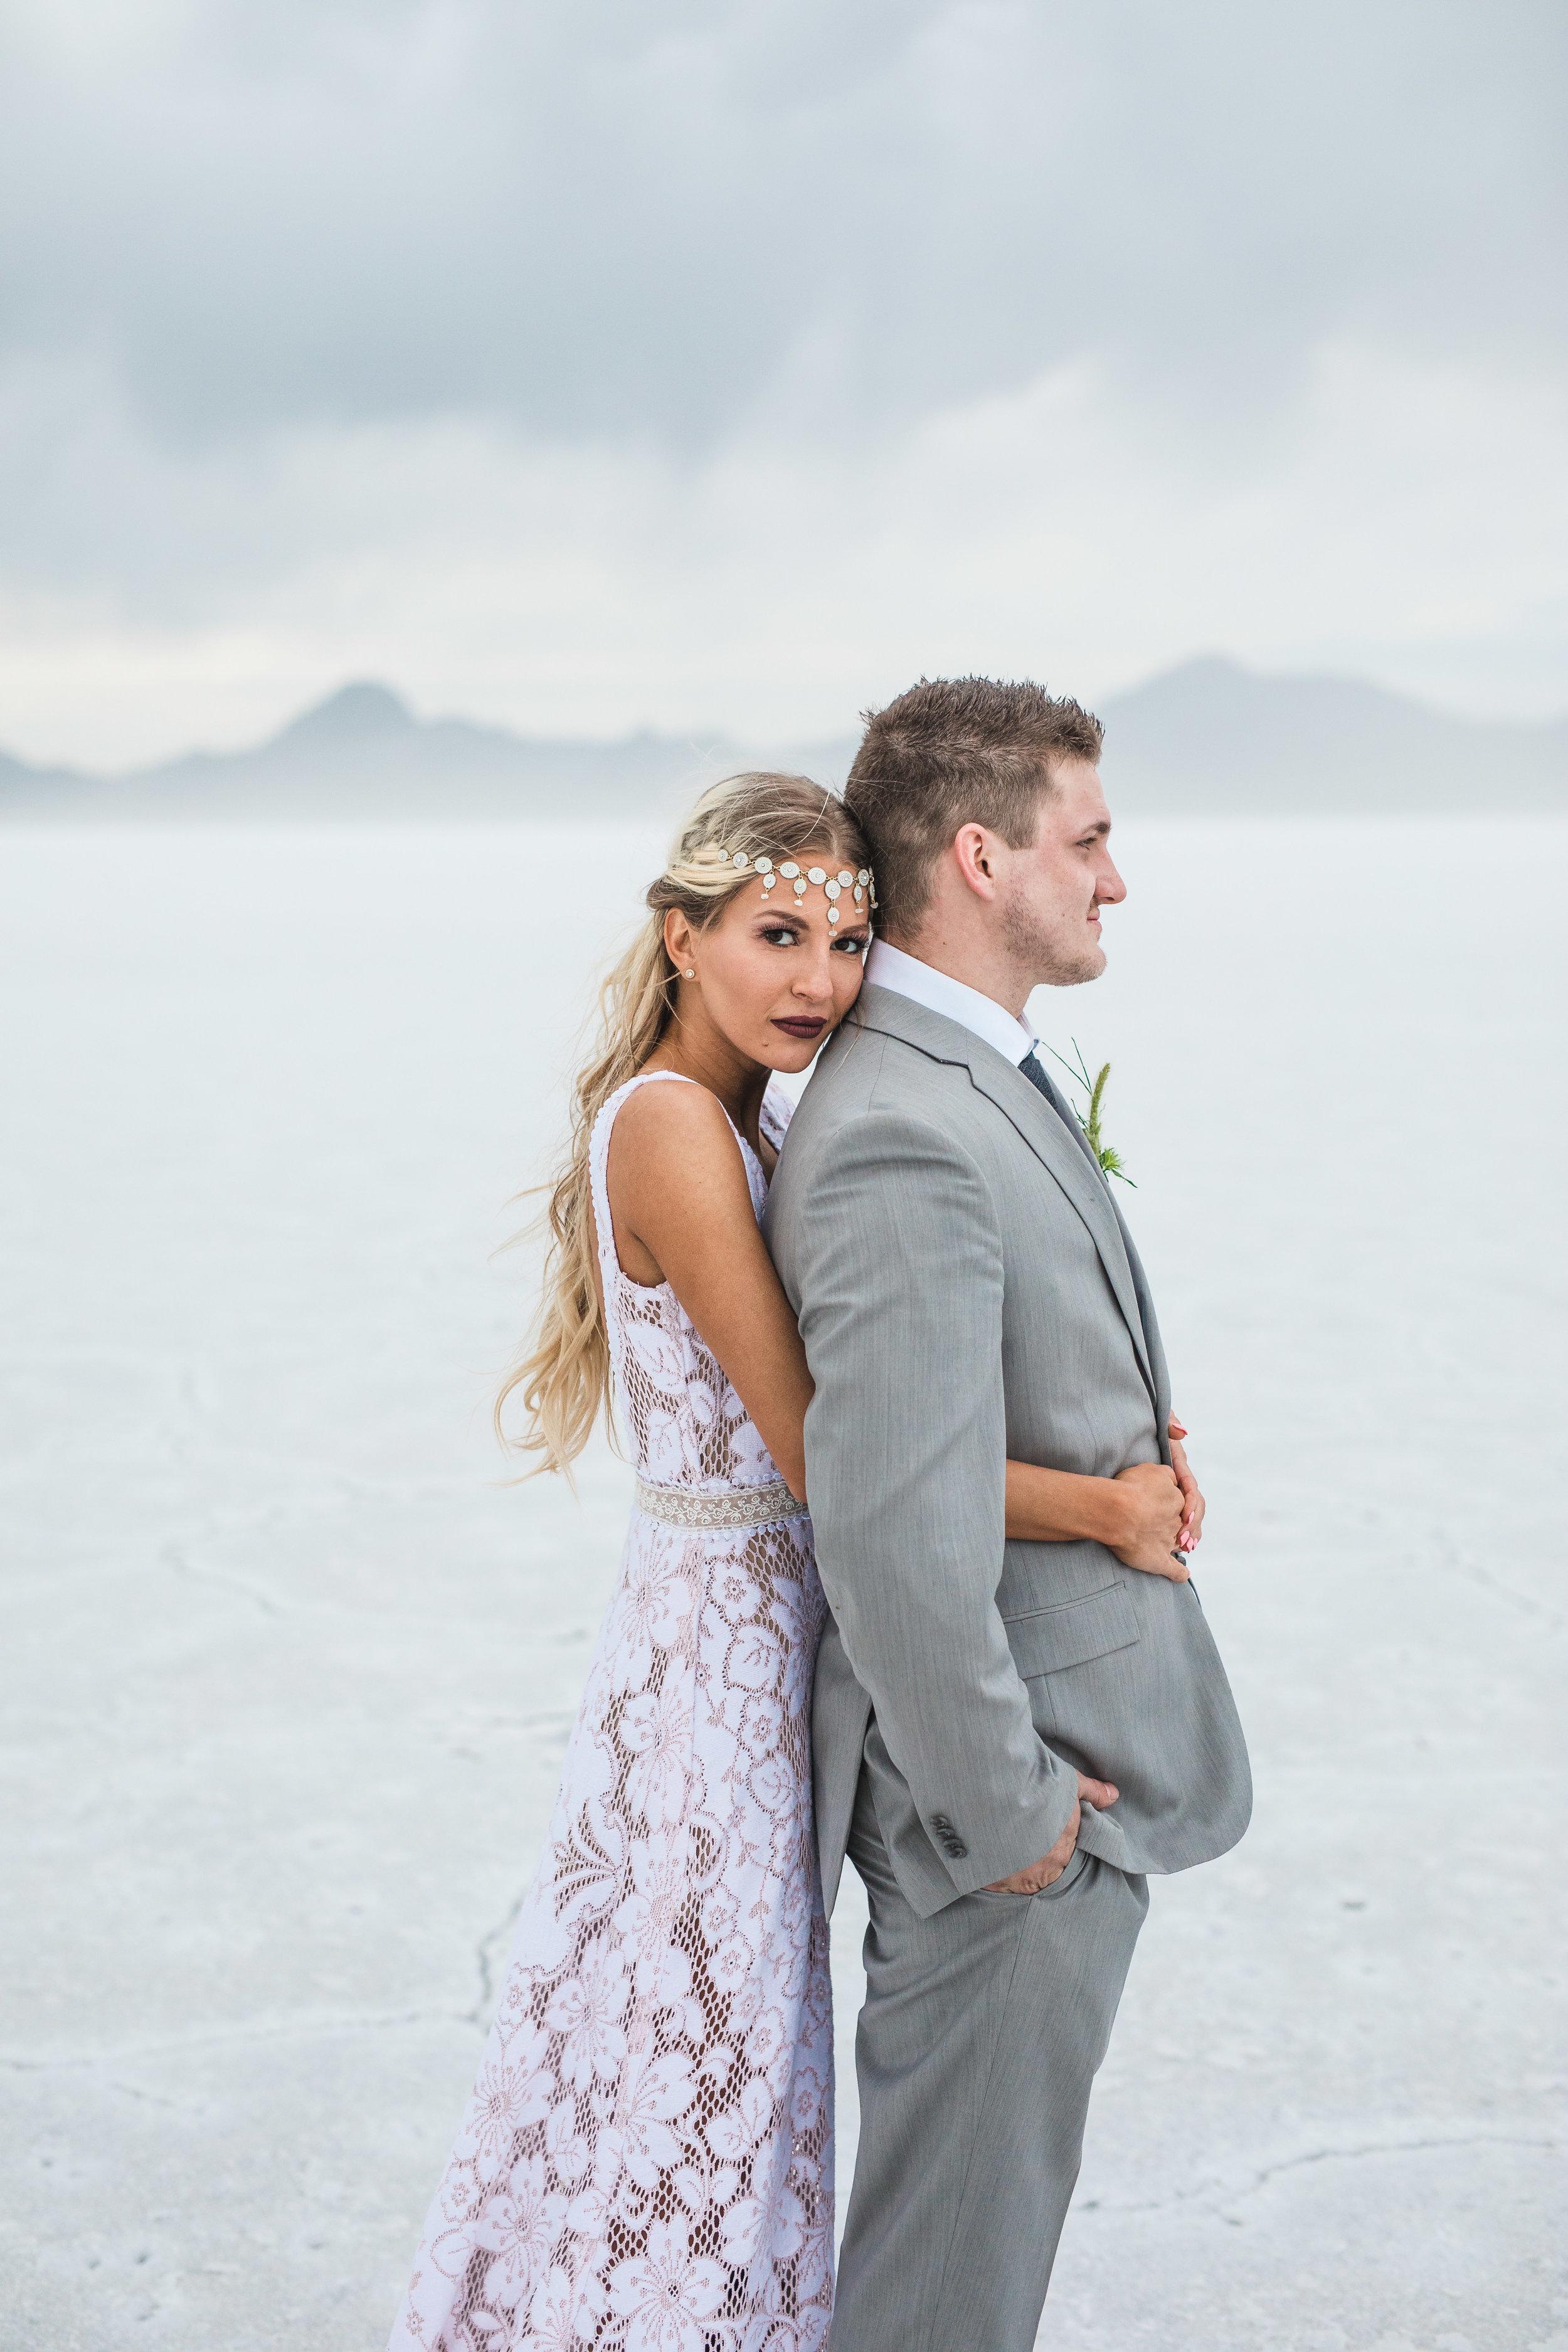 Kyle Loves Tori Kenny Dawn bridal collaboration Bonneville Salt Flats